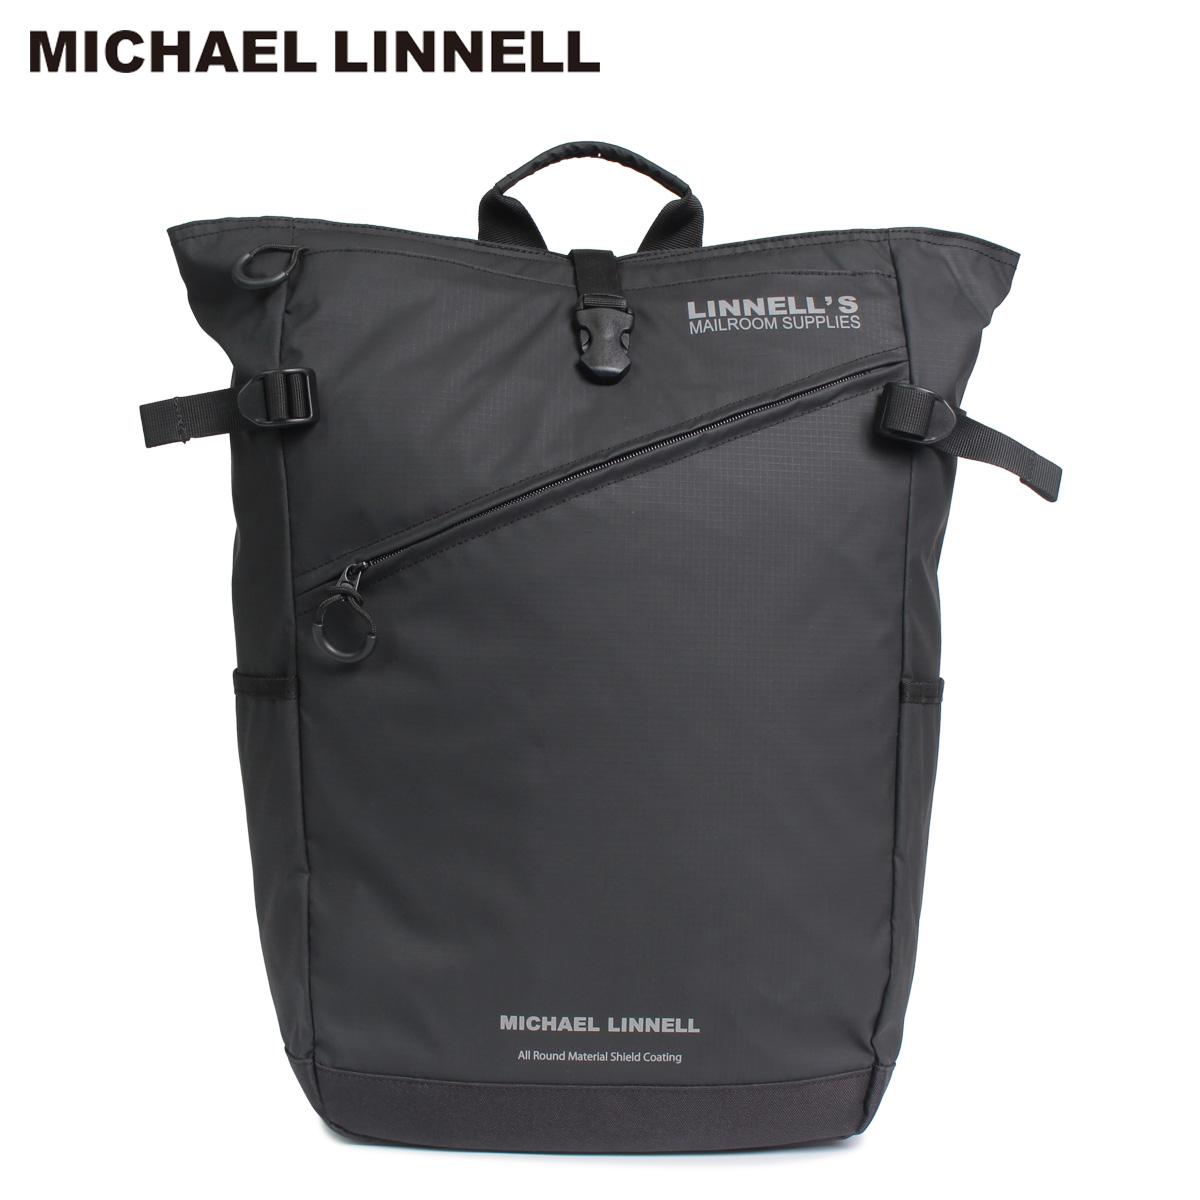 MICHAEL LINNELL ARMS マイケルリンネル リュック バッグ 25L メンズ レディース バックパック MLAC-09